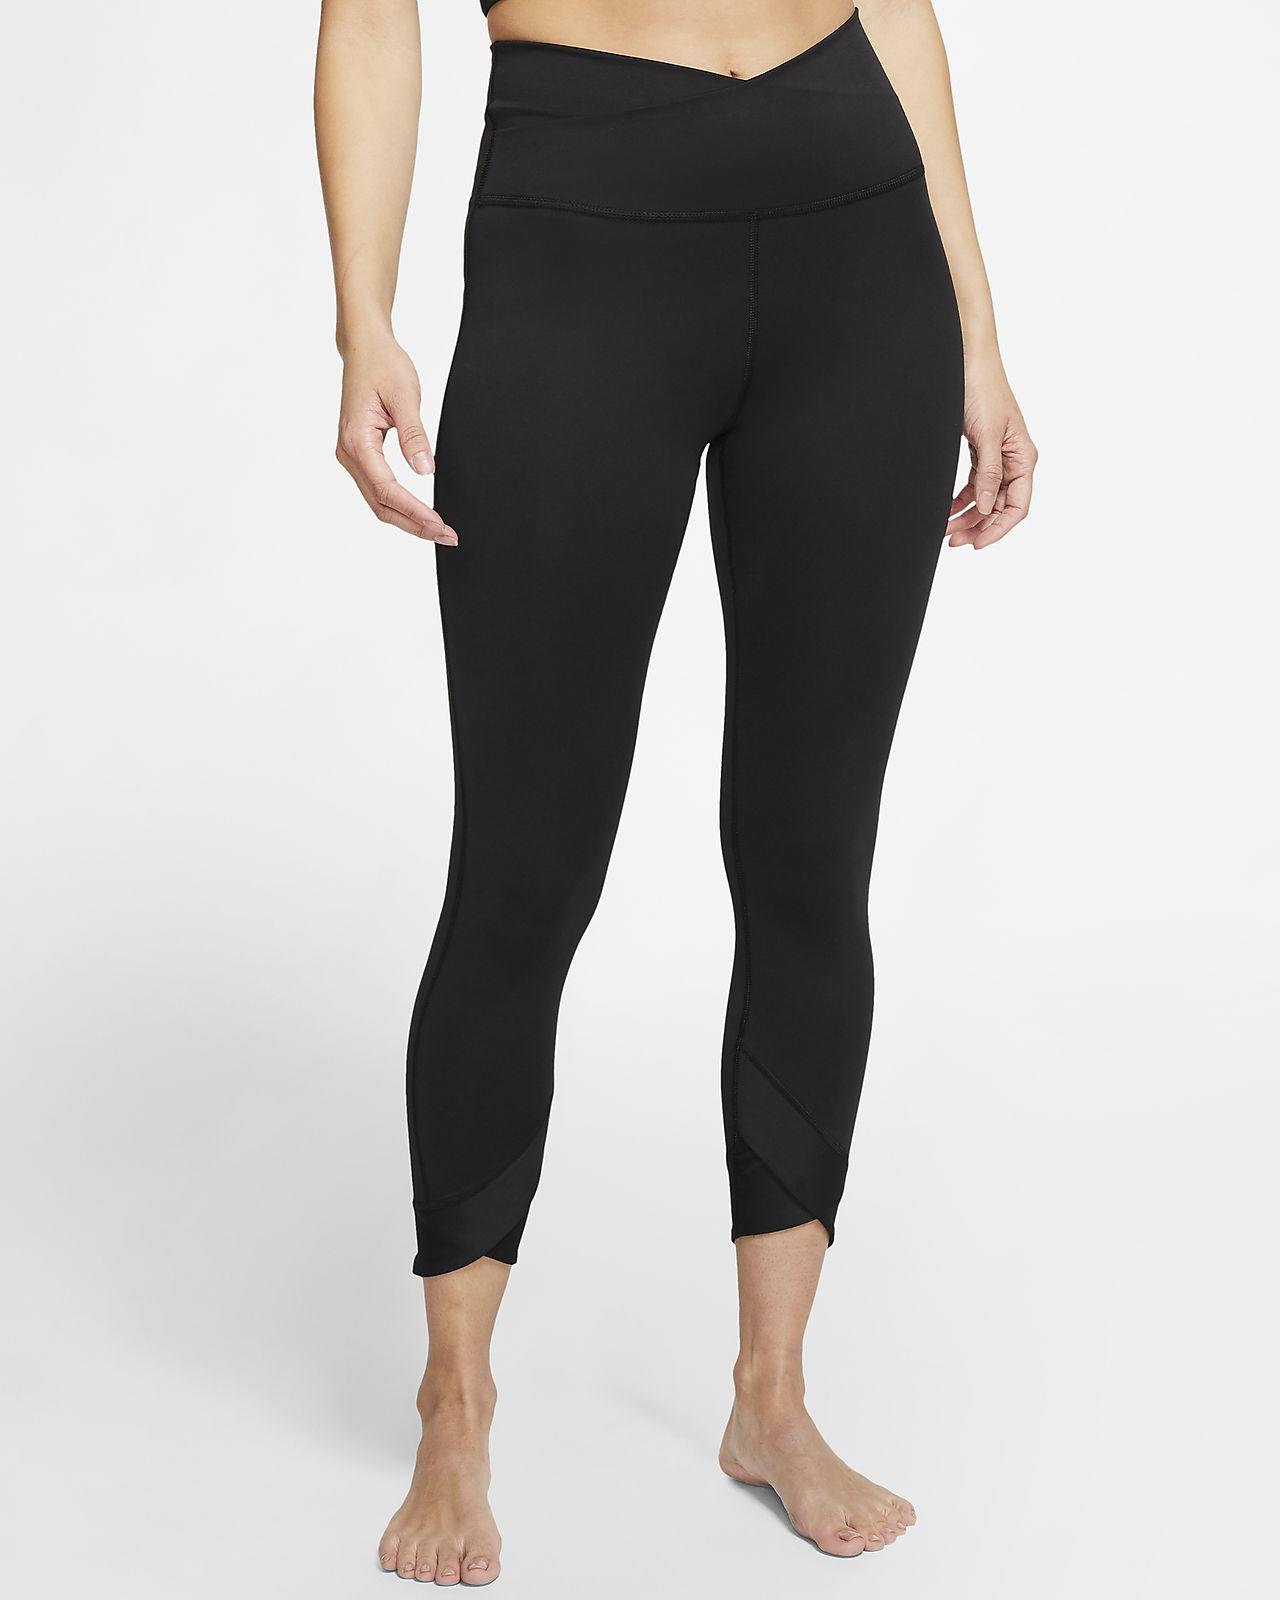 Legging 78 Nike Yoga pour Femme